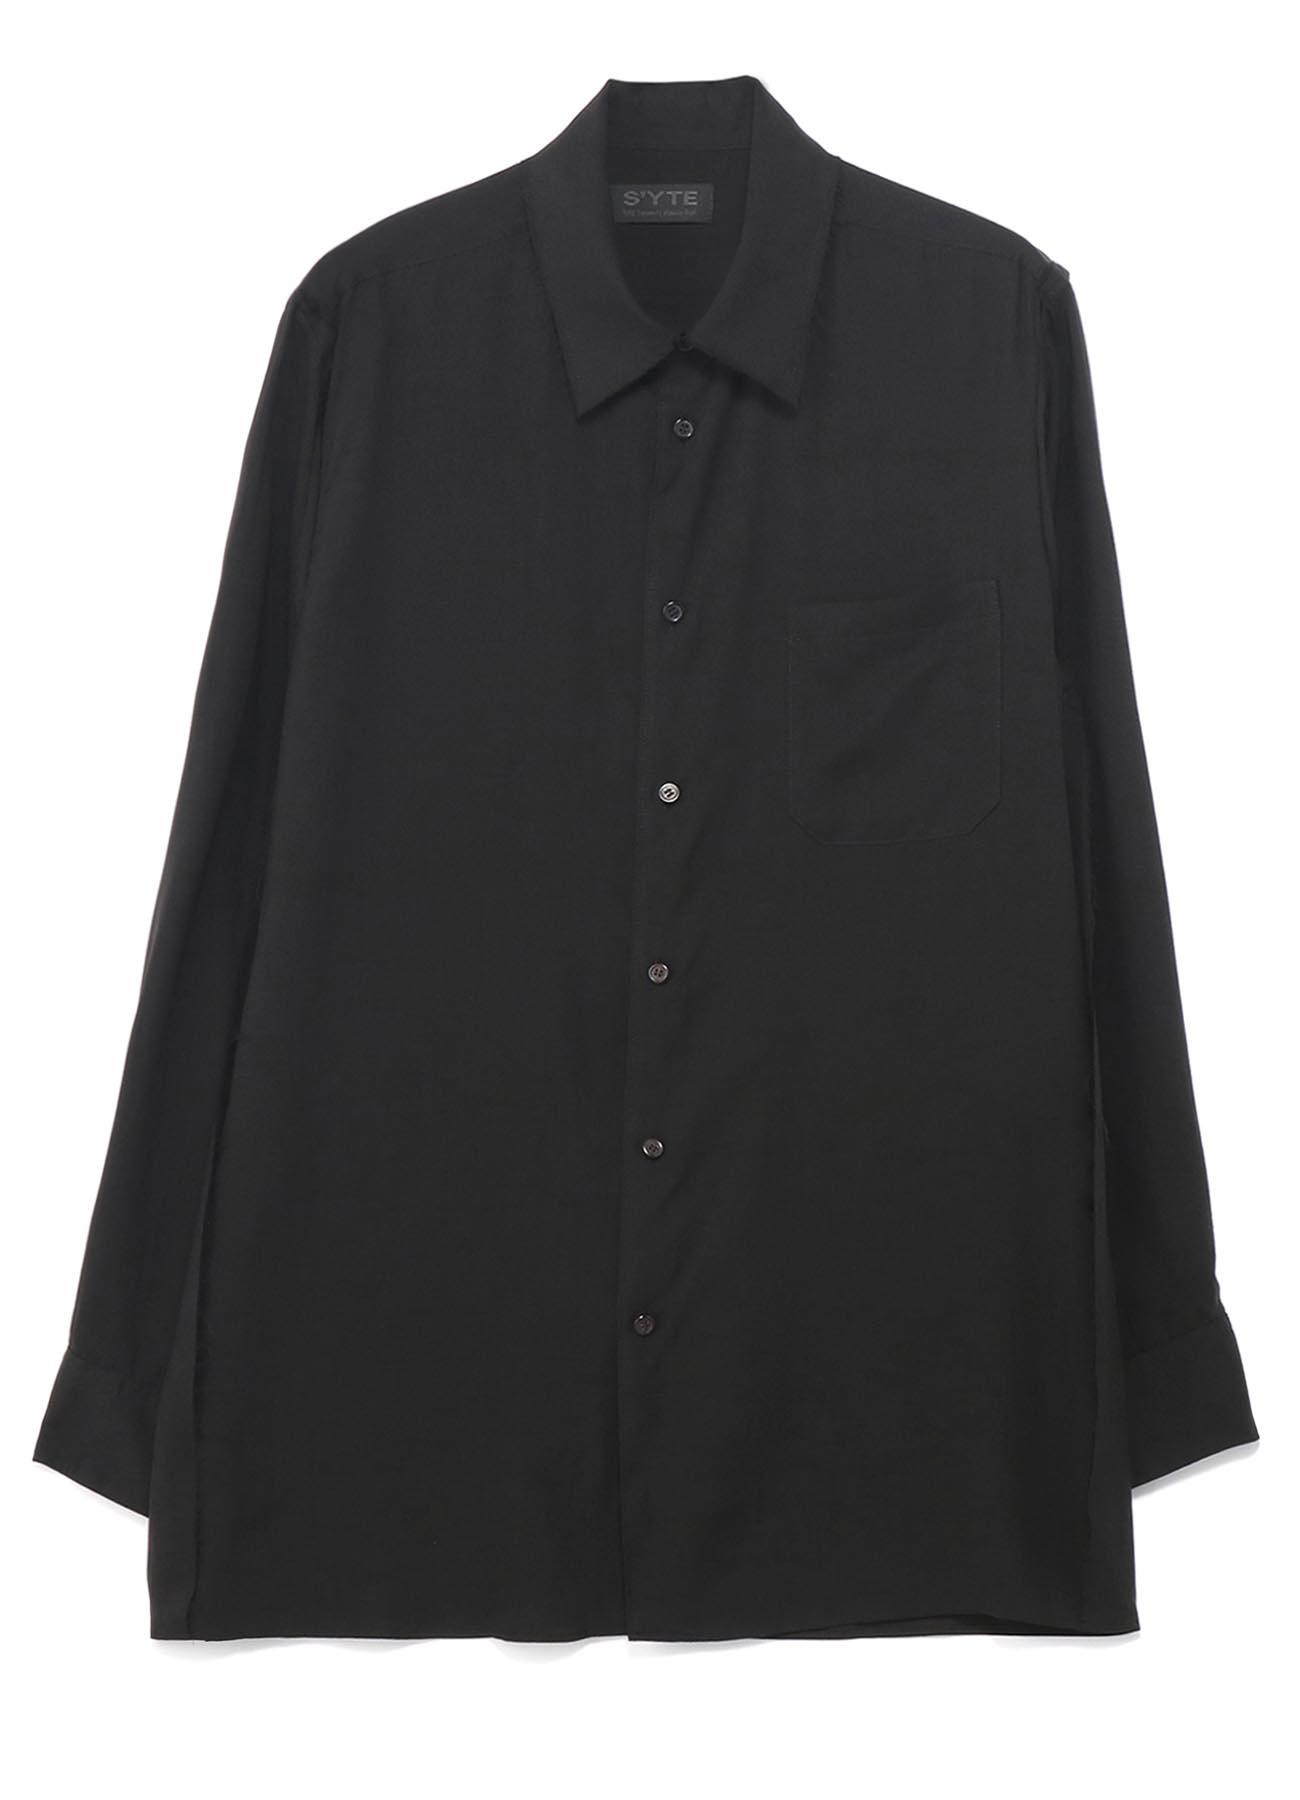 Tencel /Loan Cut off Regular Collar Shirt